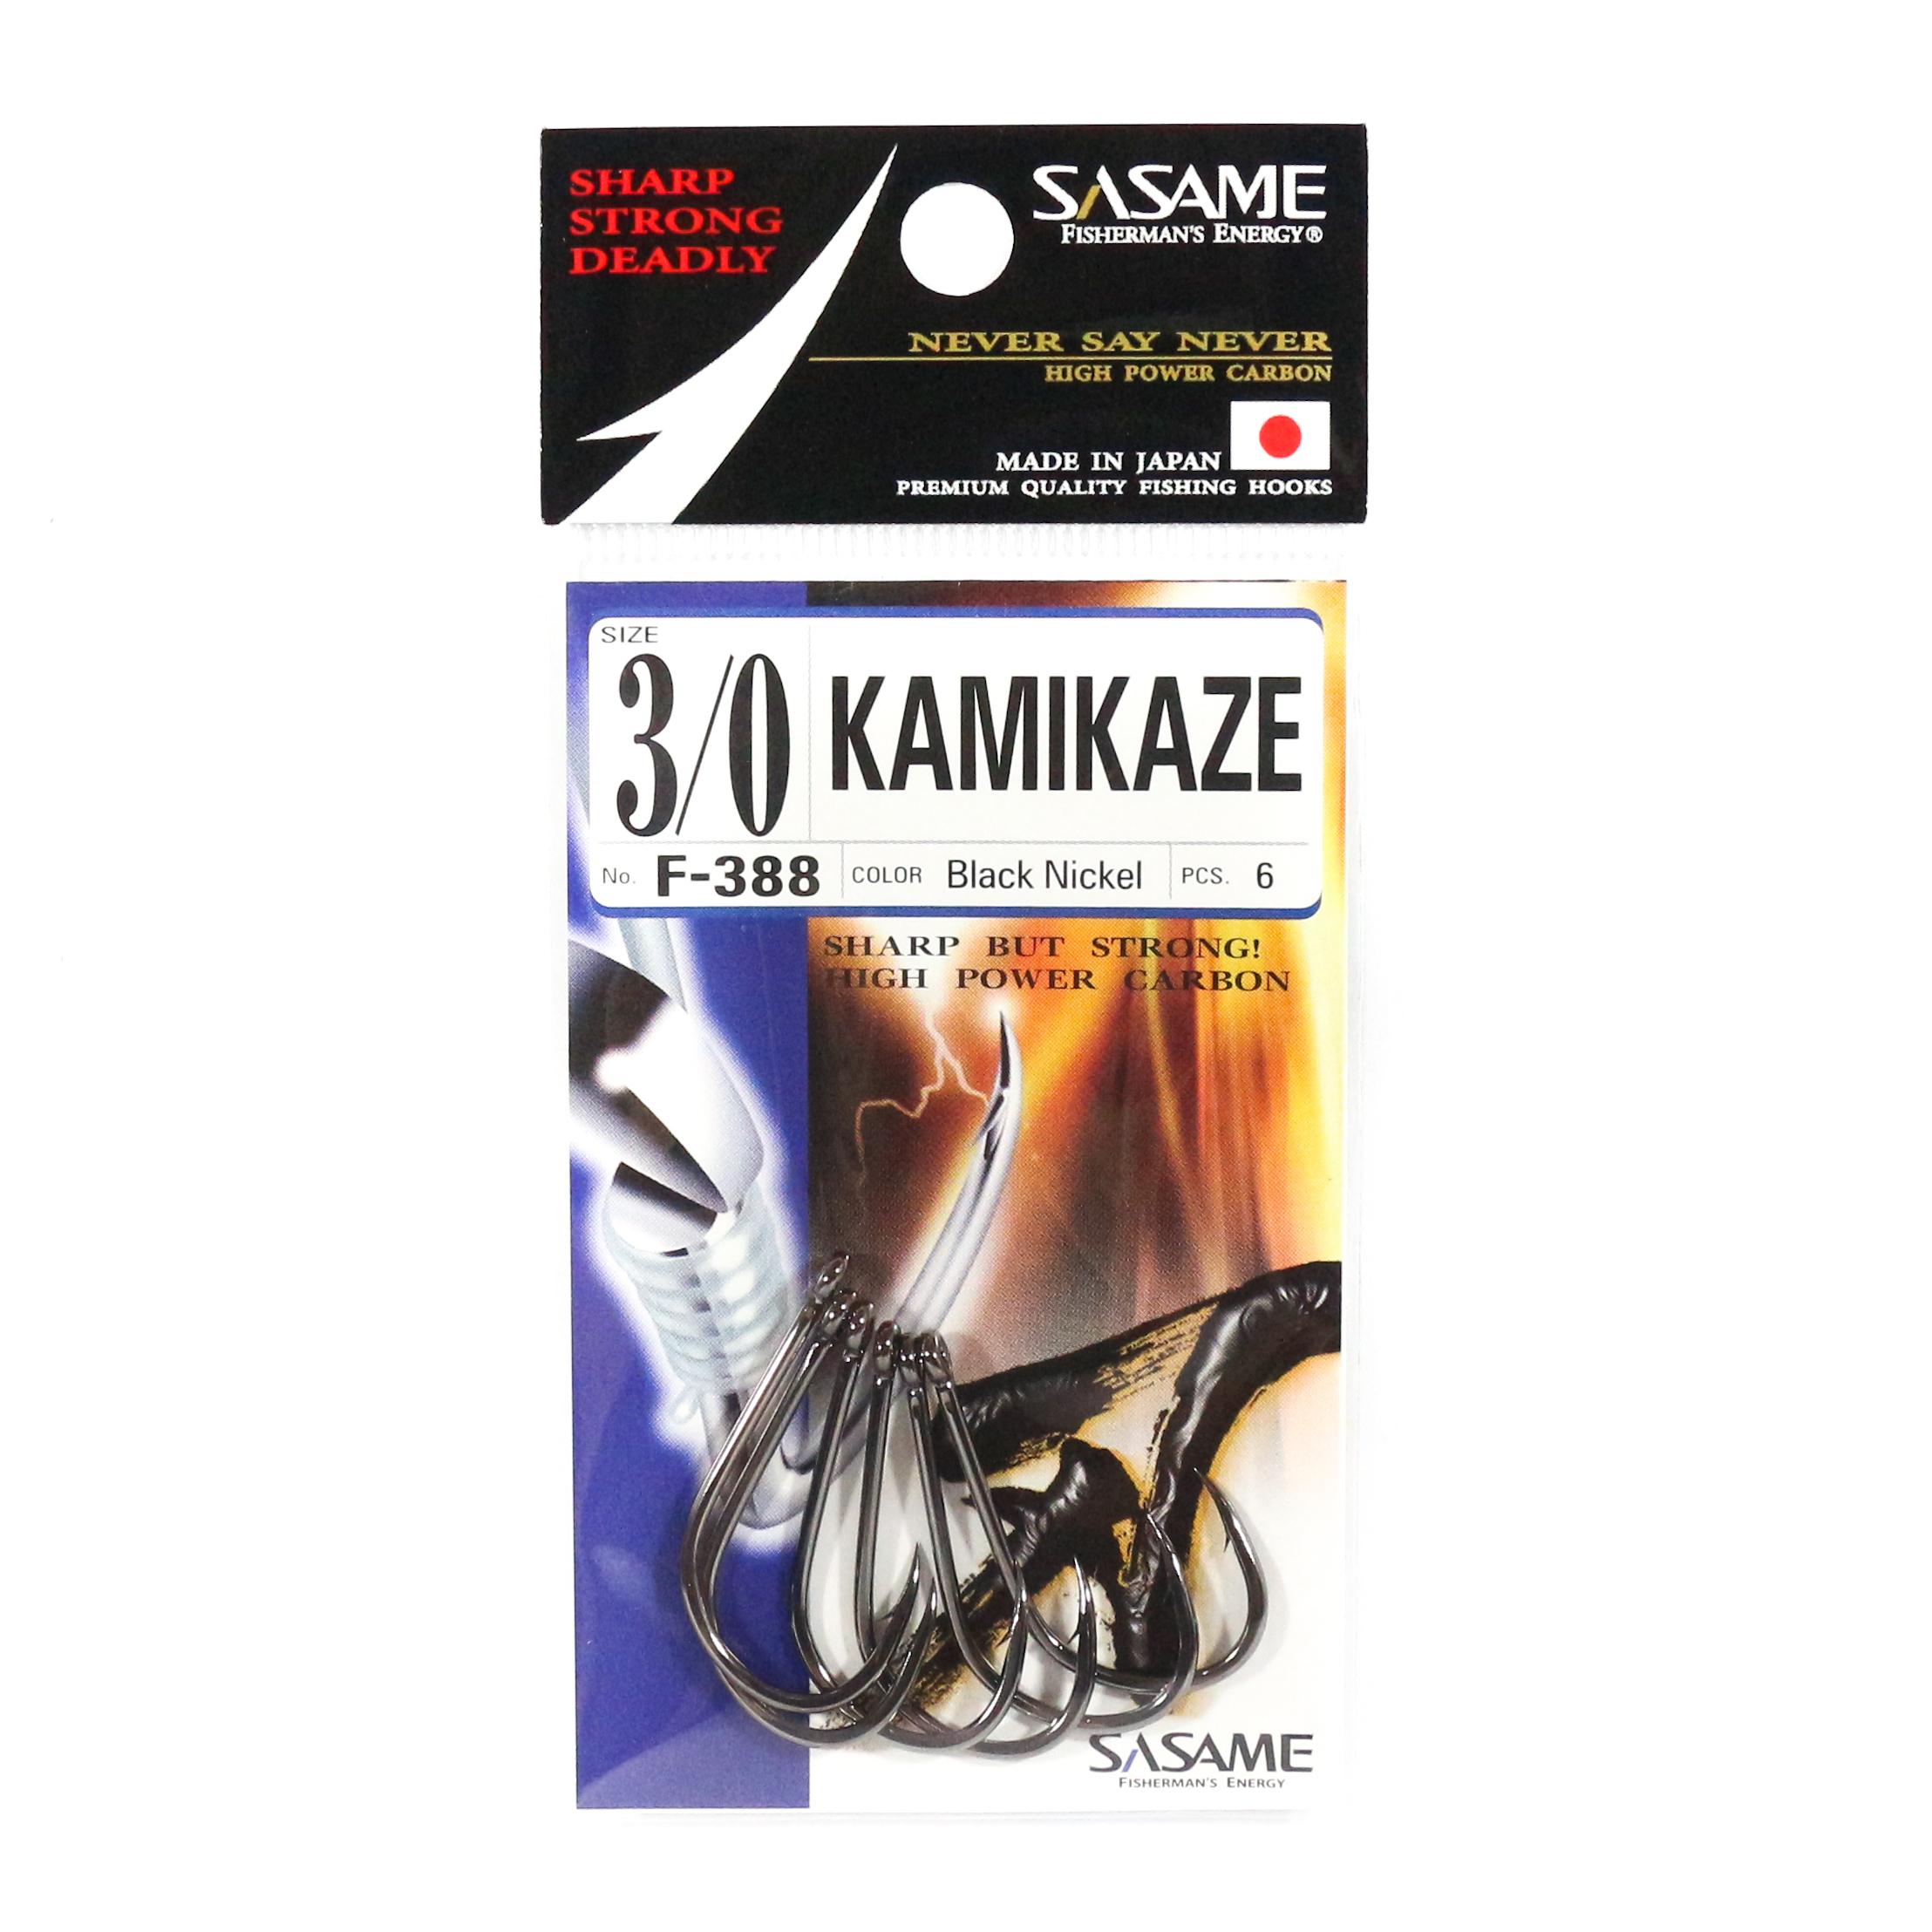 Sasame F-388 Kamikaze Straight Shank Offset Hook Size 3/0 (4859)